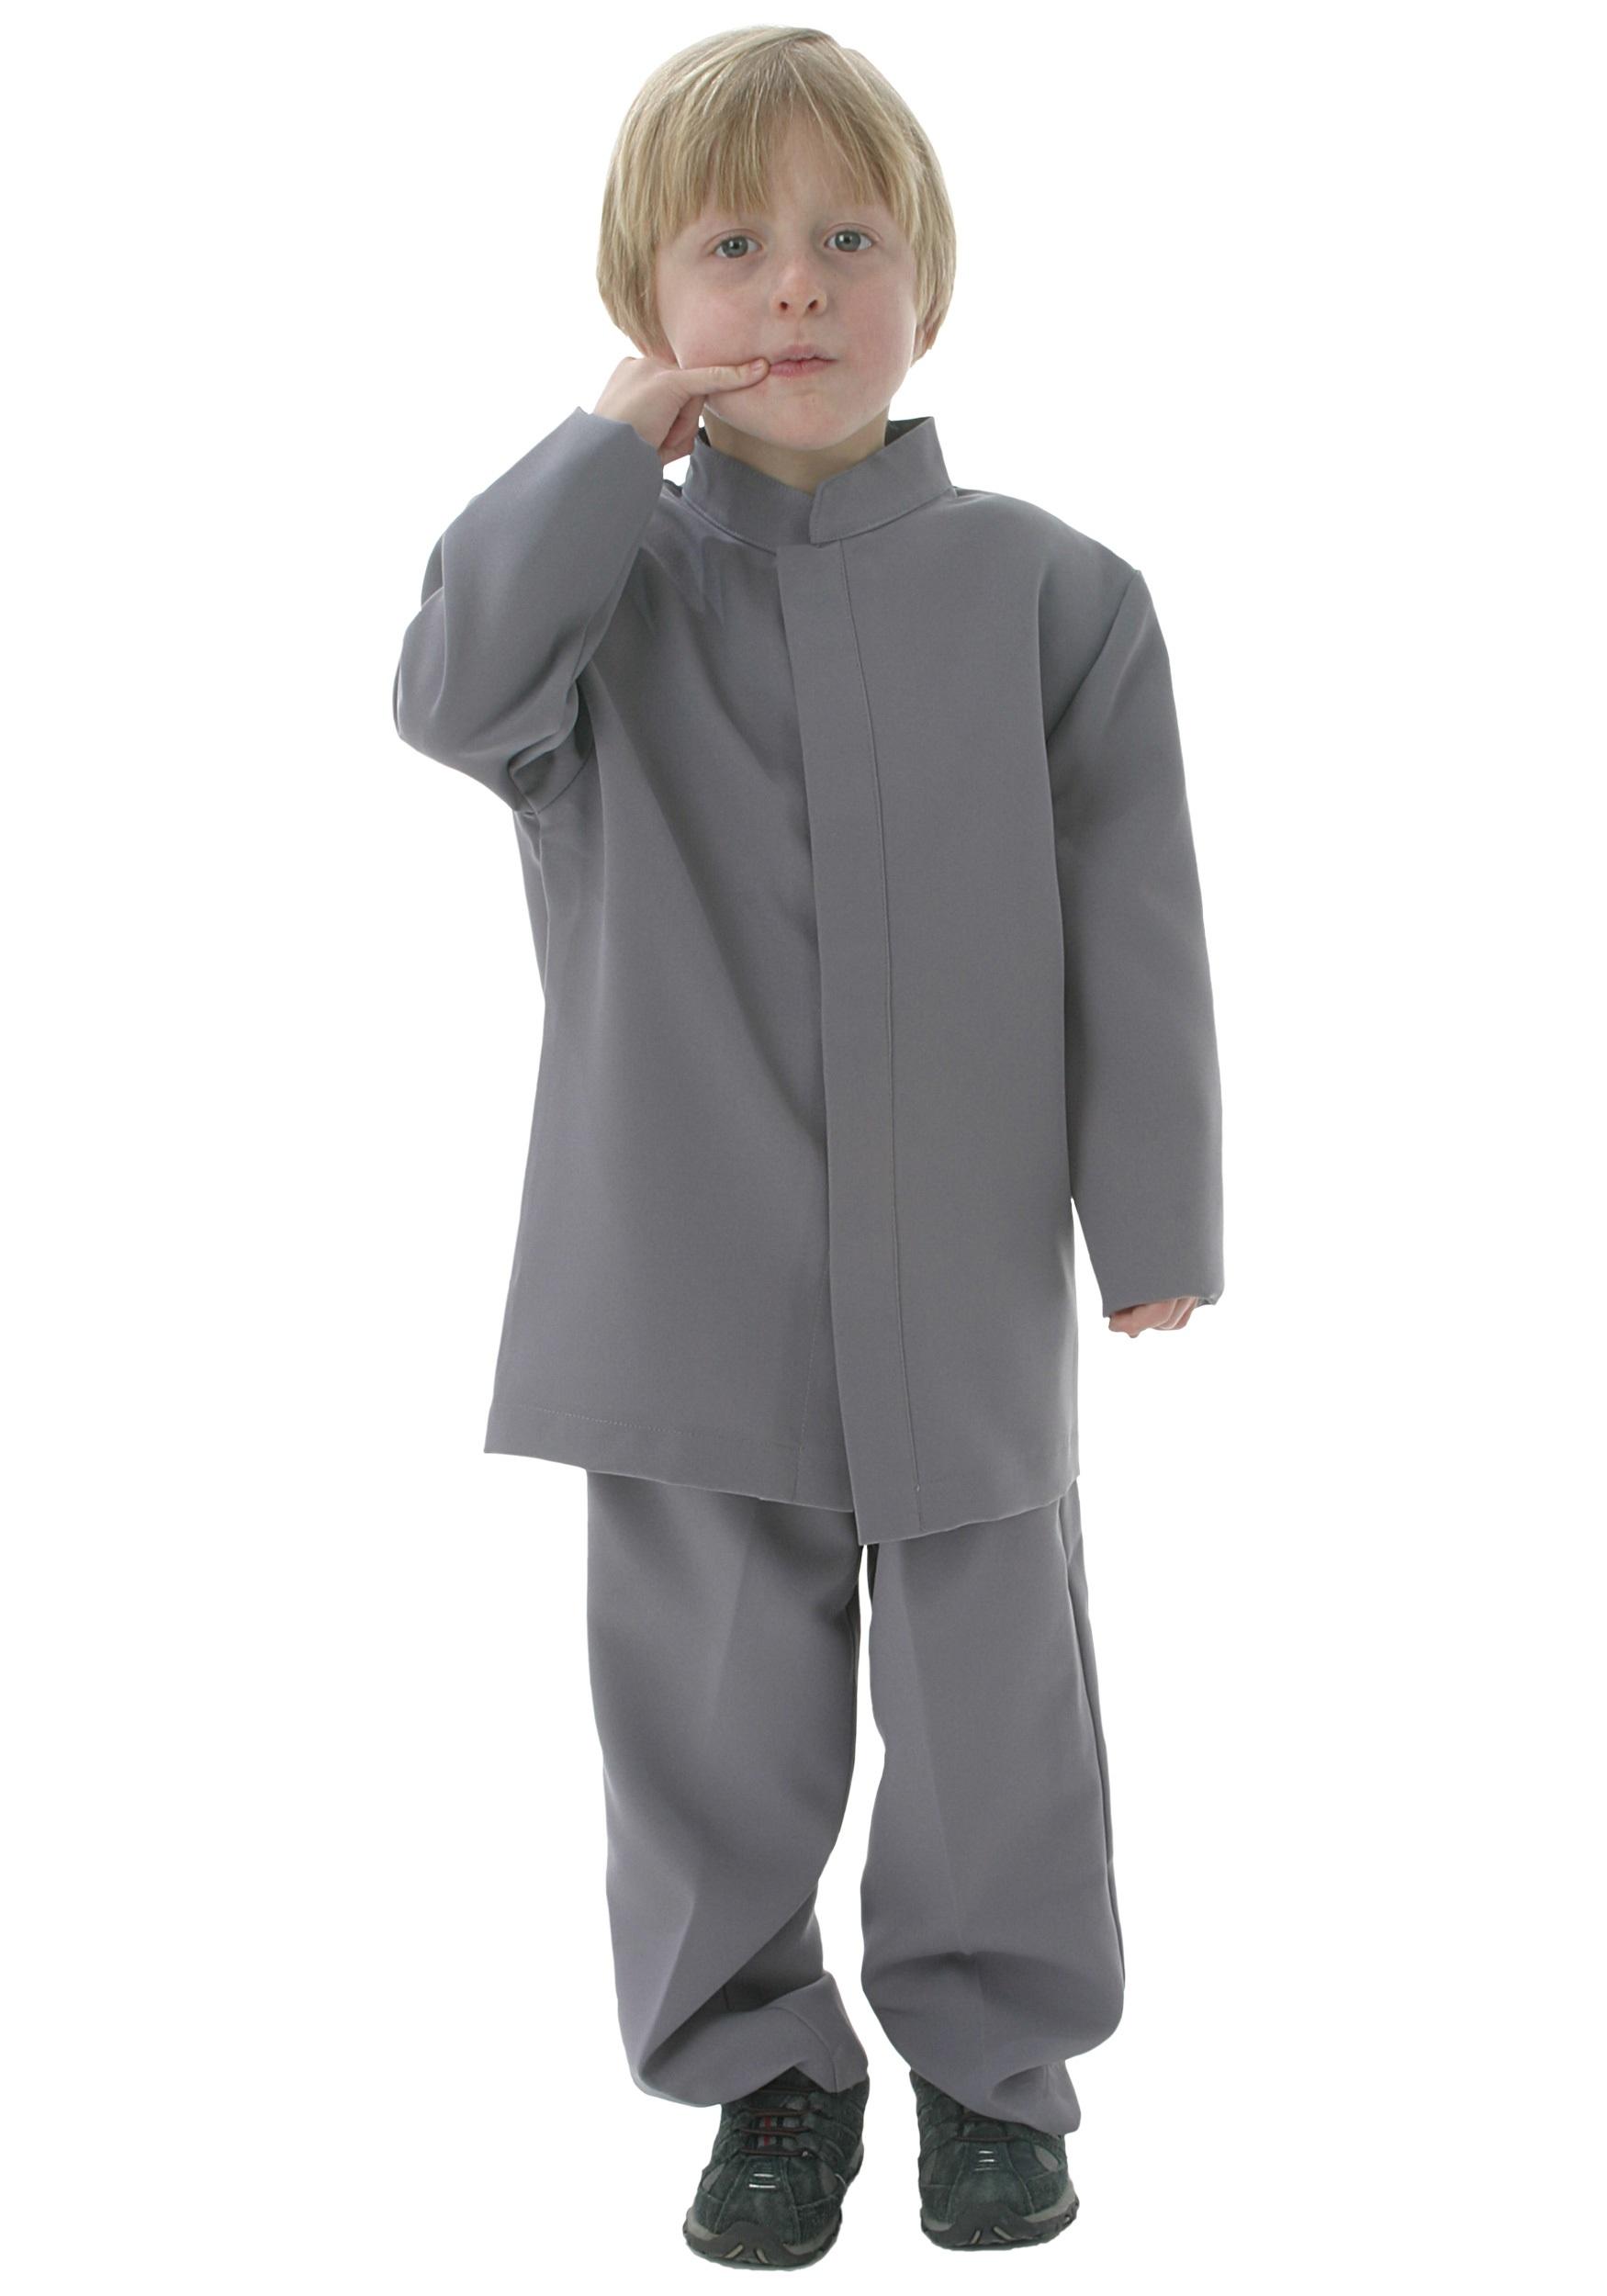 Austin Powers Costumes